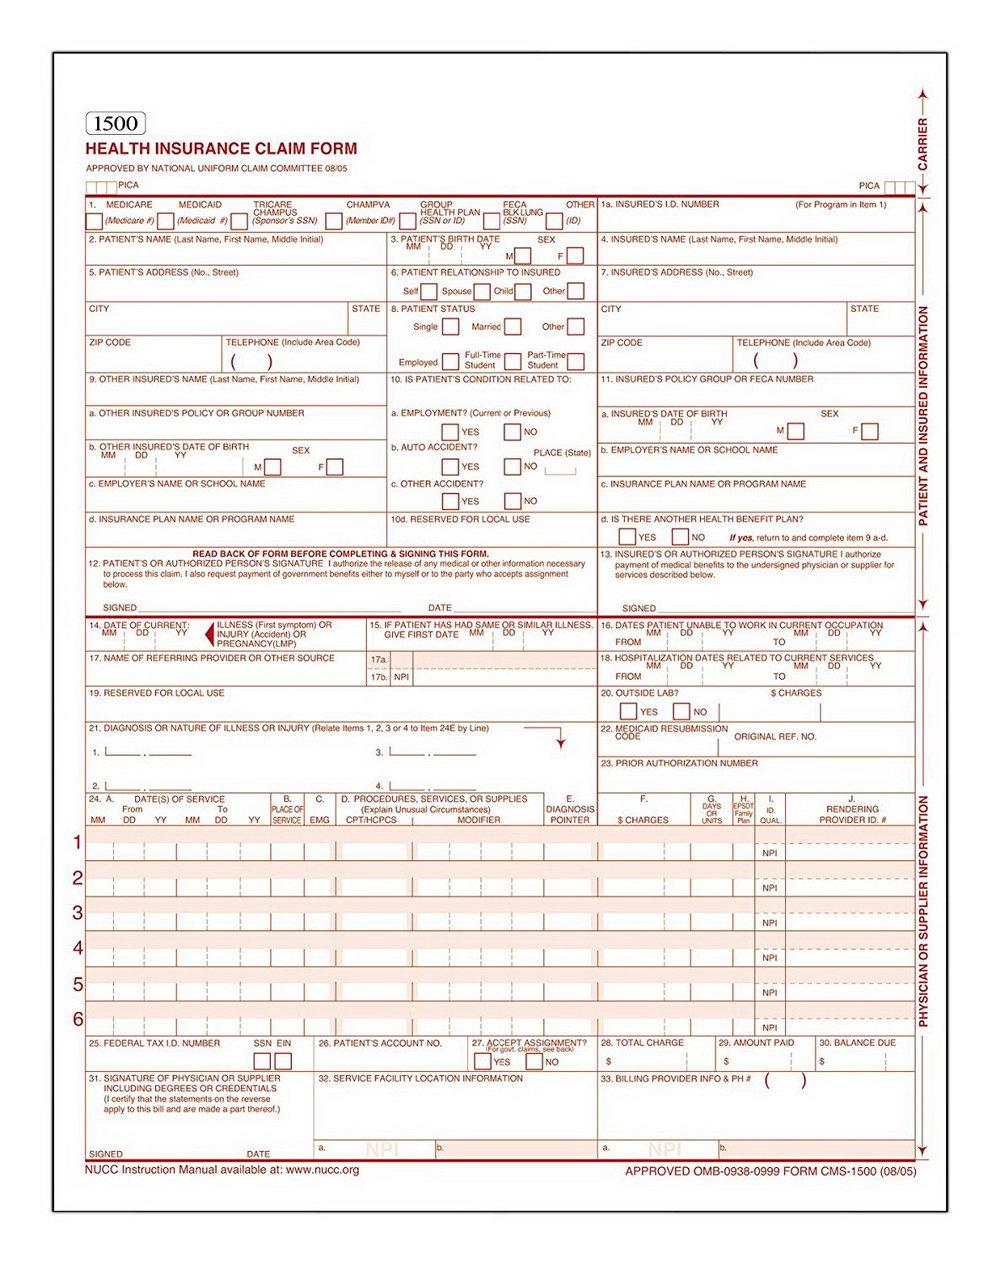 Hcfa 1500 Form 2017